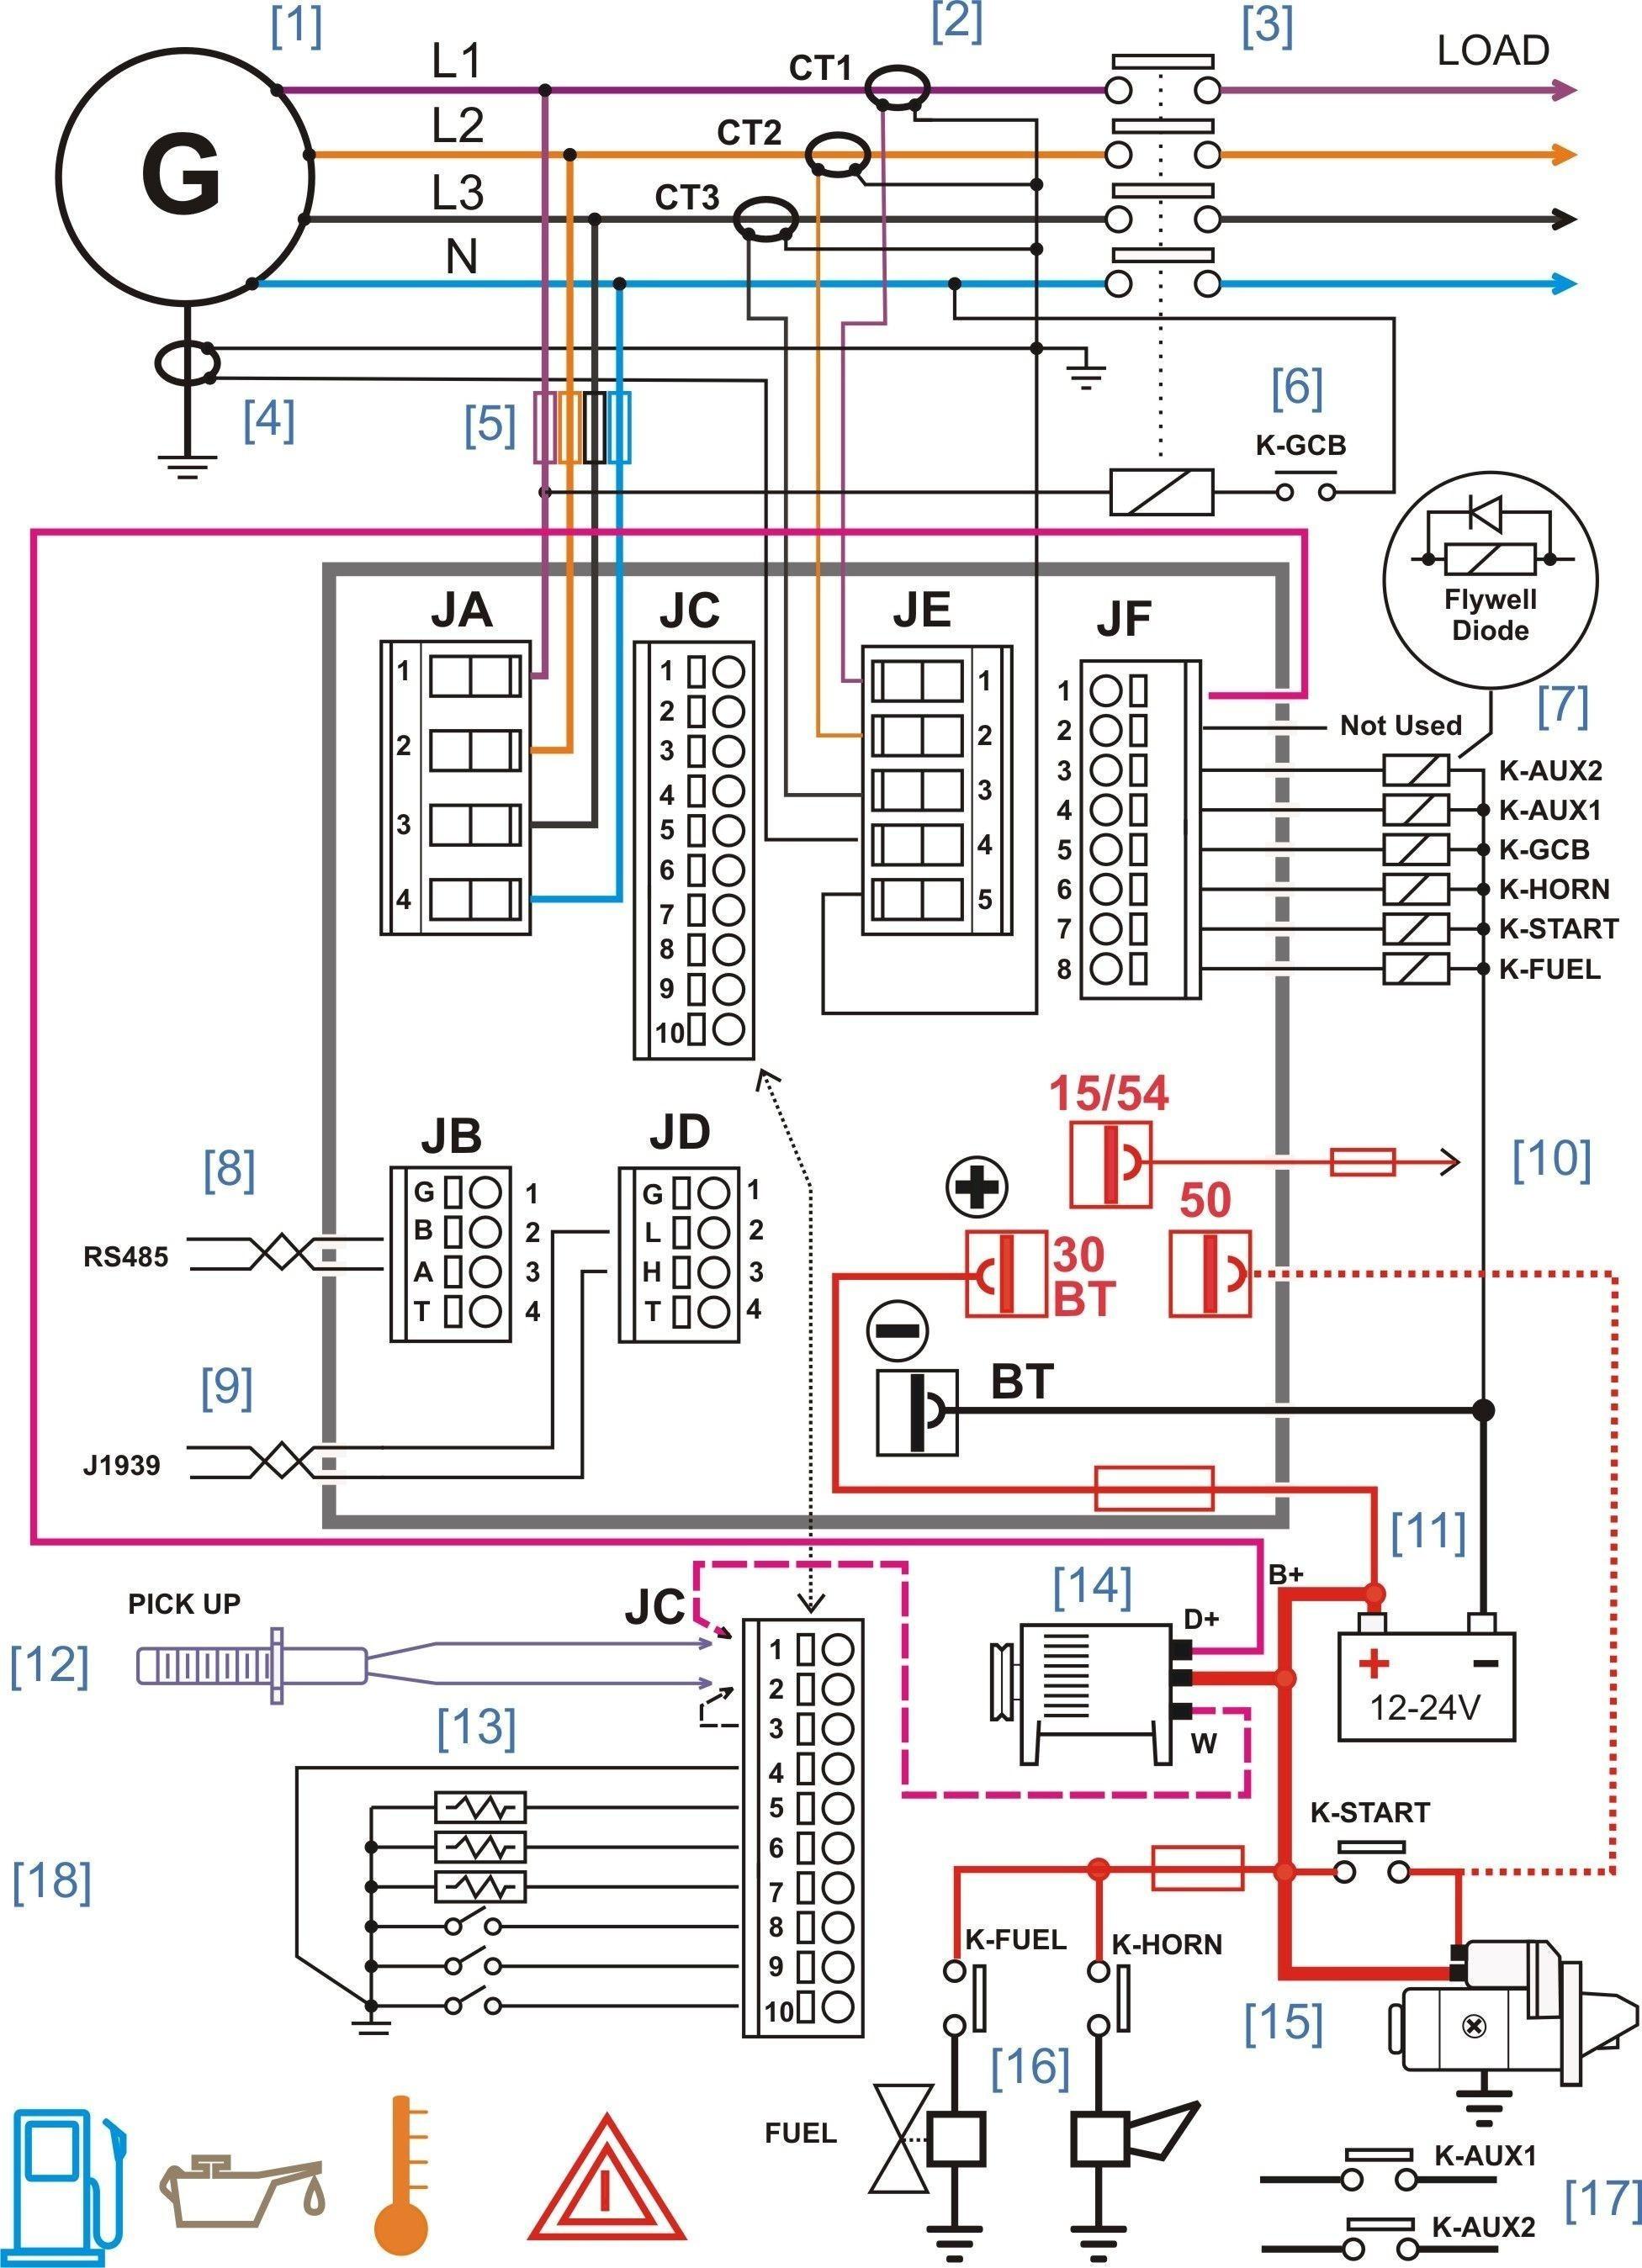 50 Amp Rv Plug Wiring Diagram Home Generator Wiring 30 Amp Detailed Schematic Diagrams Of 50 Amp Rv Plug Wiring Diagram